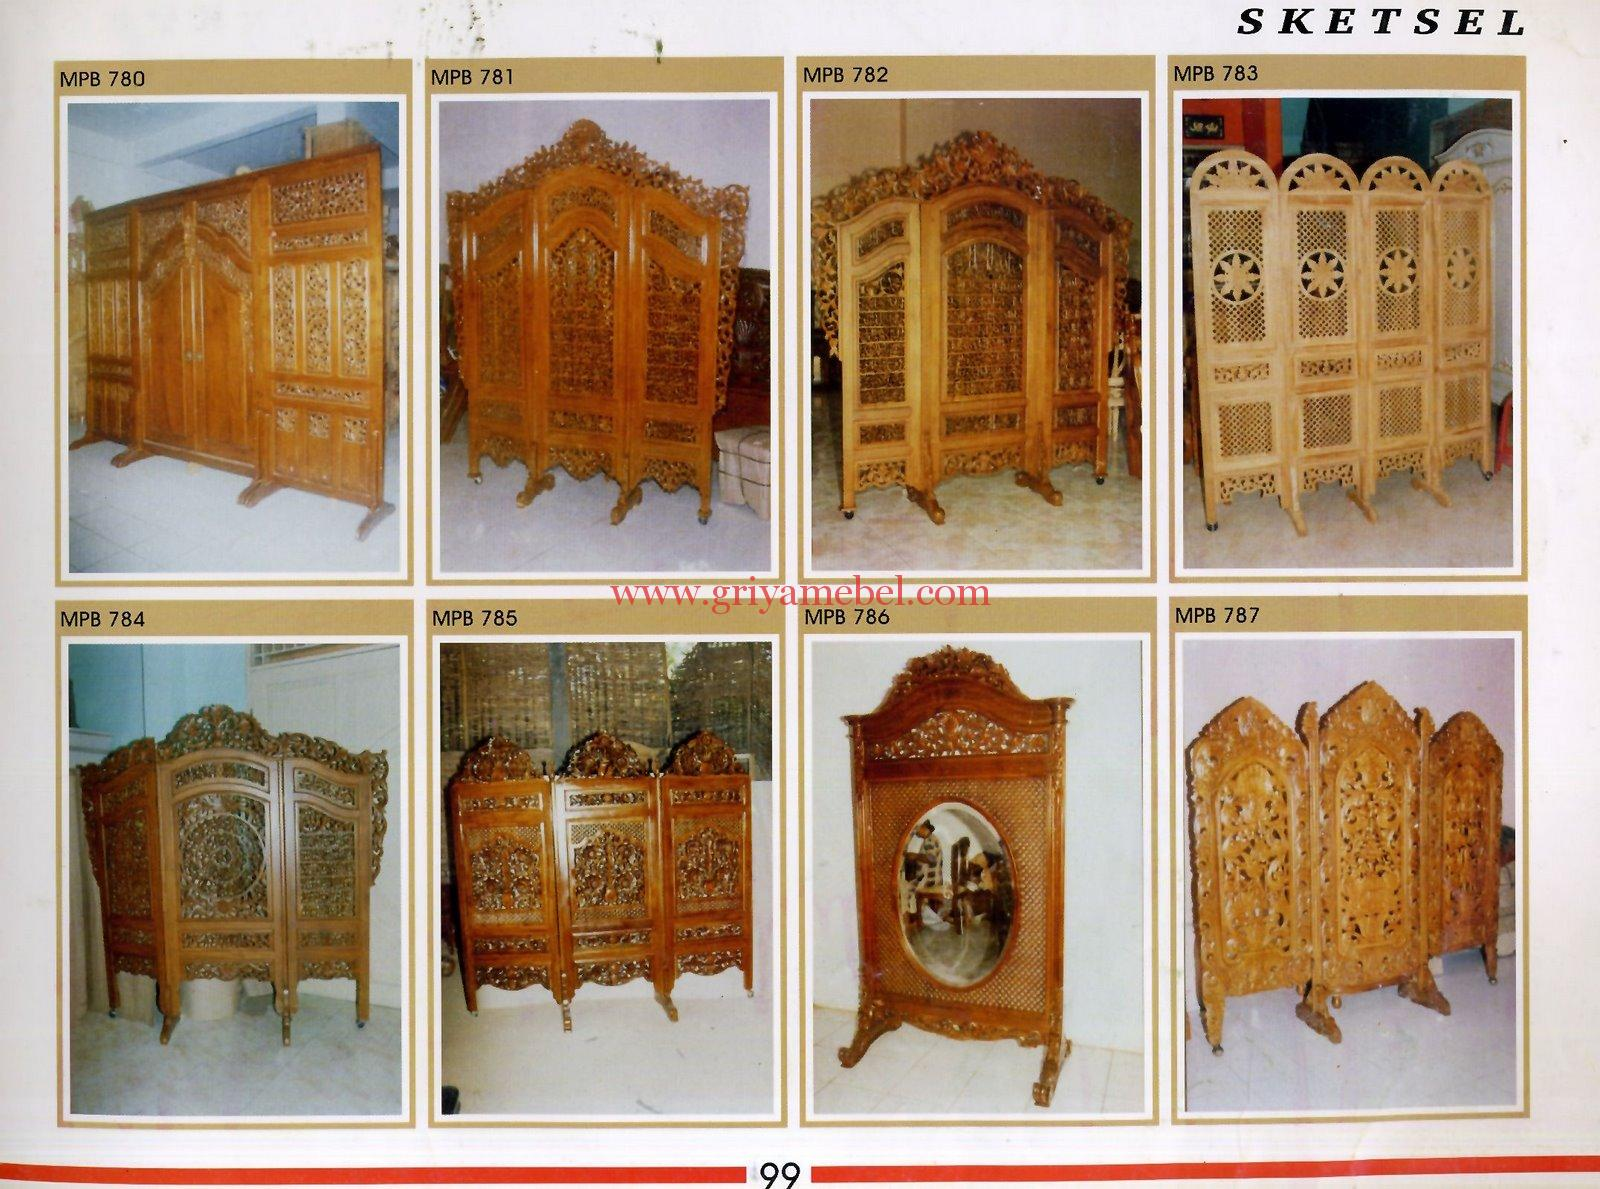 Katalog Sketsel Dan Gebyok Murah, sketsel jati, sketsel minimalis, sketsel klasik, sketsel ukiran, sketsel murah, gebyok jati, gebyok joglo, gebyok ukiran, gebyok murah, gebyok ukiran, gazebo, gebyok rumah, gebyok pintu, gebyok rumah, gebyok pintu, gebyok jendela